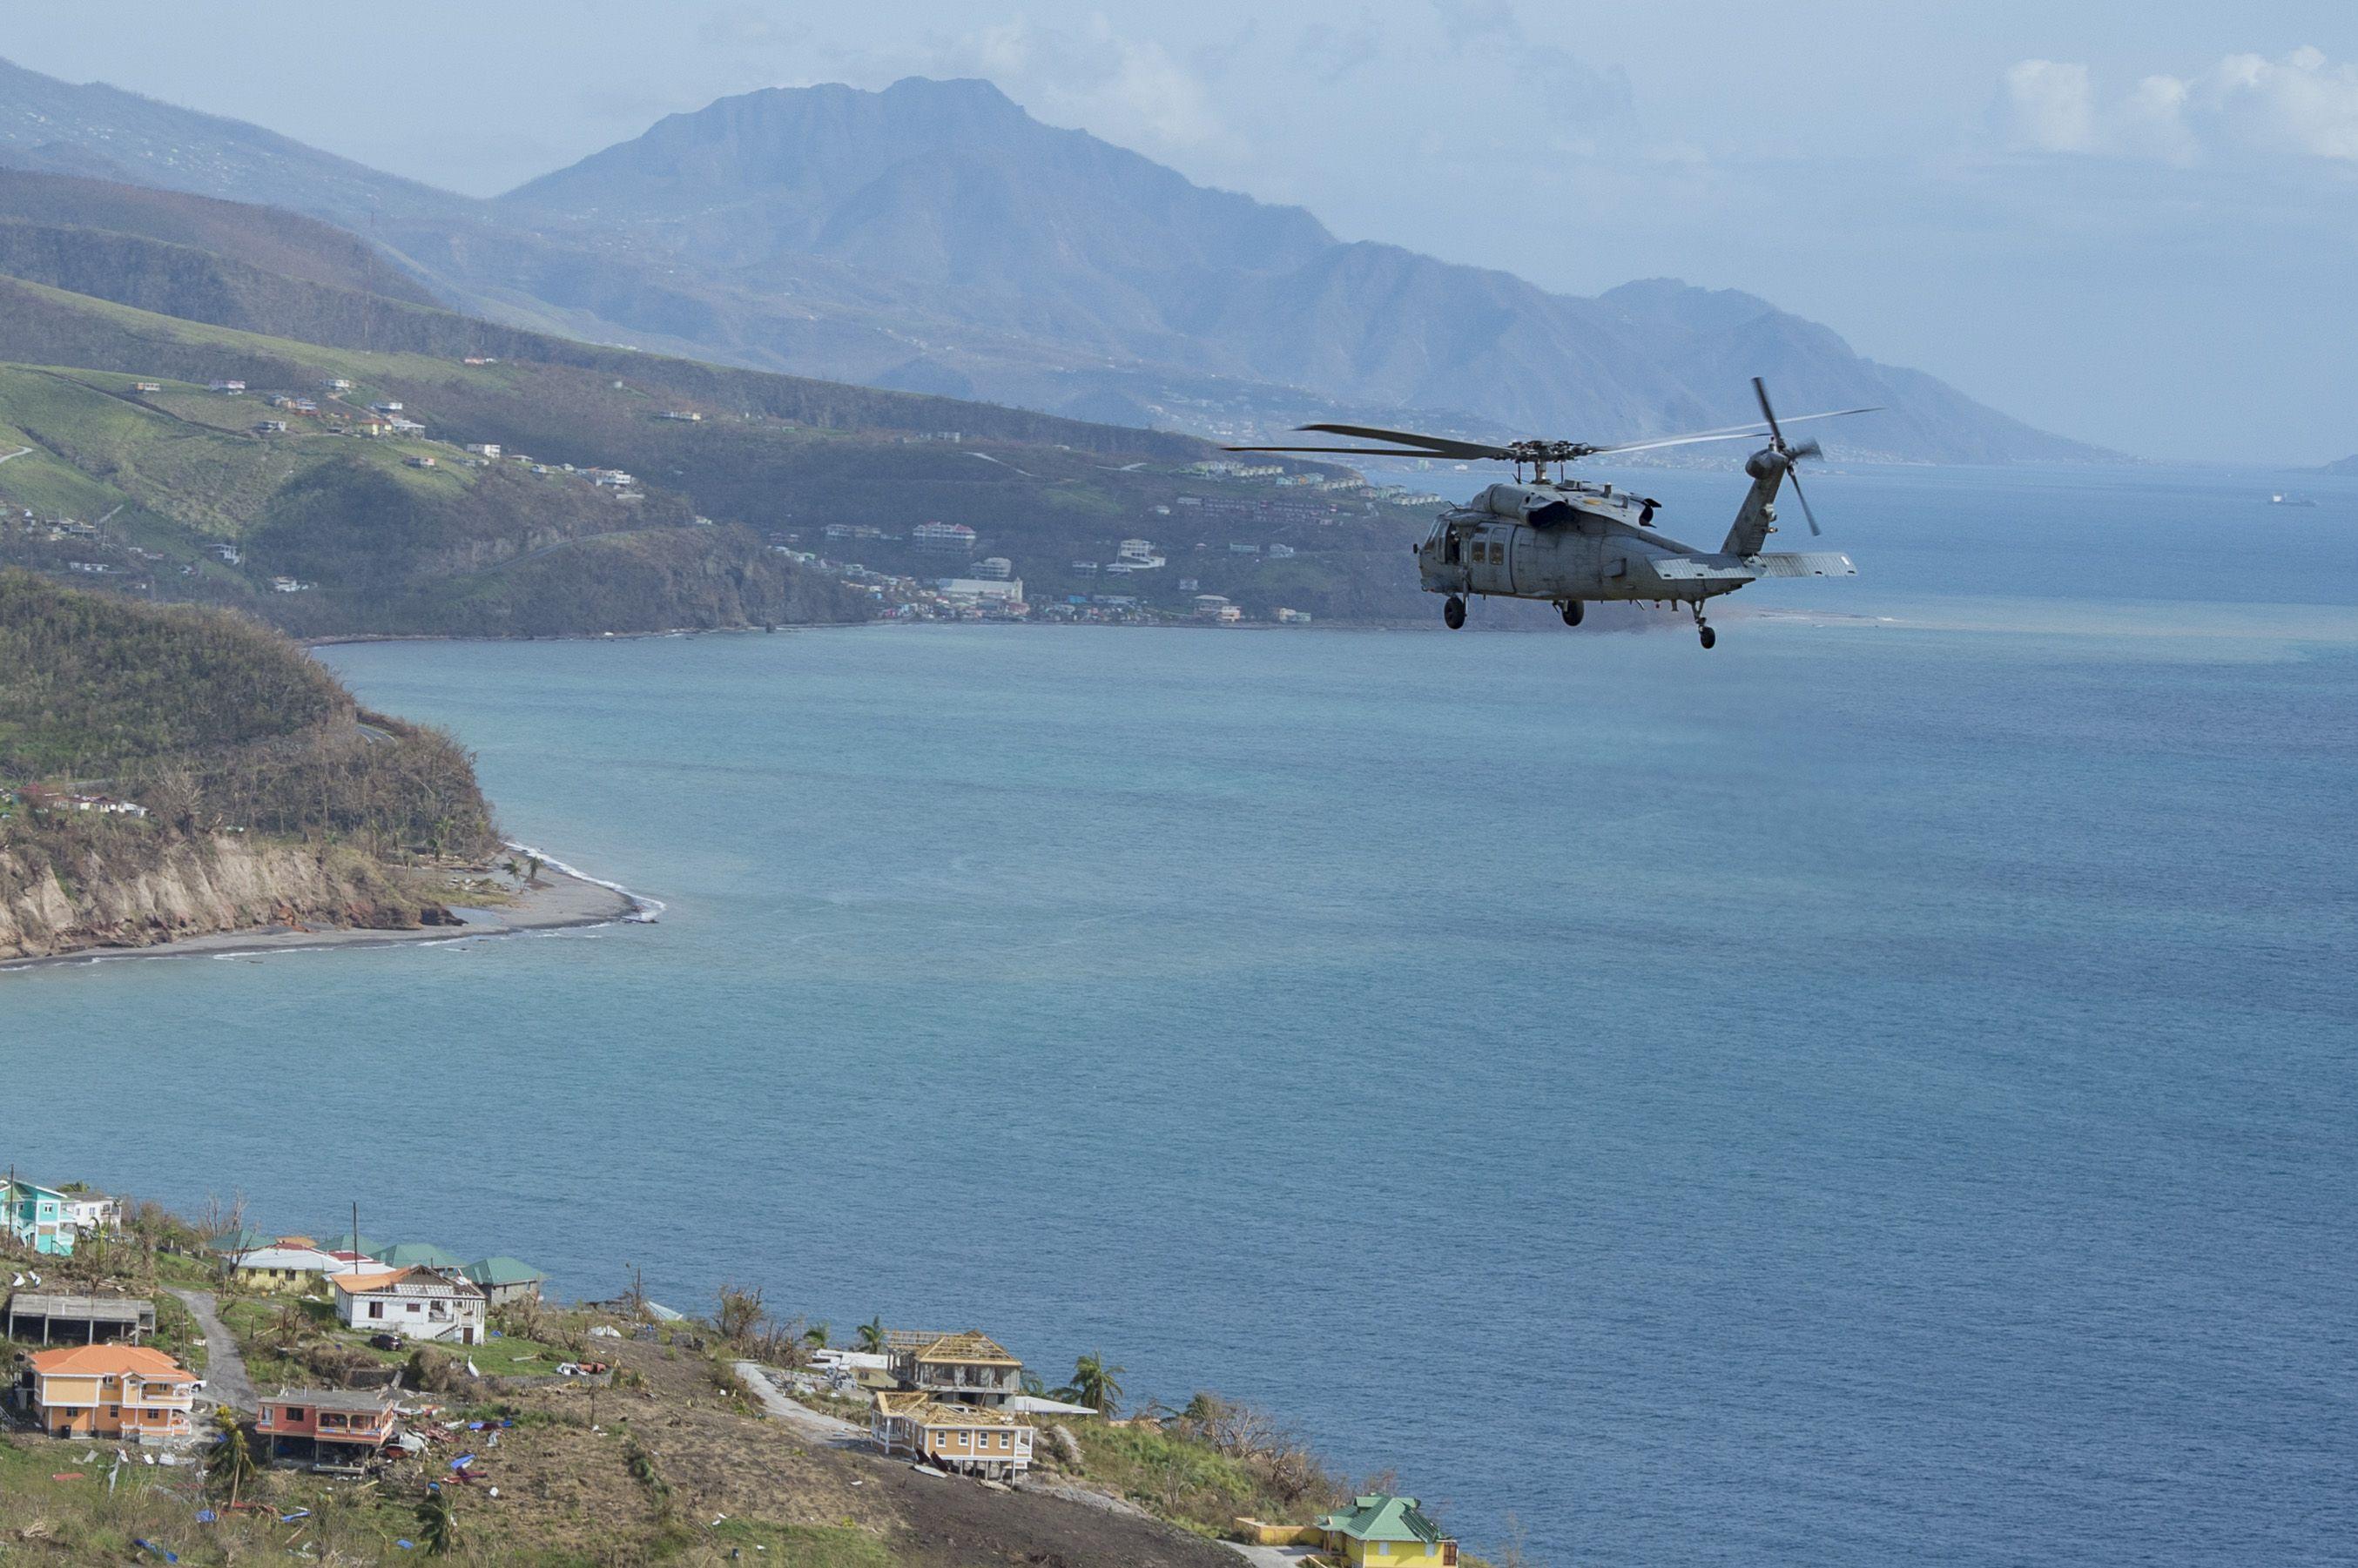 Usni News Fleet And Marine Tracker Sept 25 2017 Usni News Puerto Rico Vacation Puerto Rico Travel